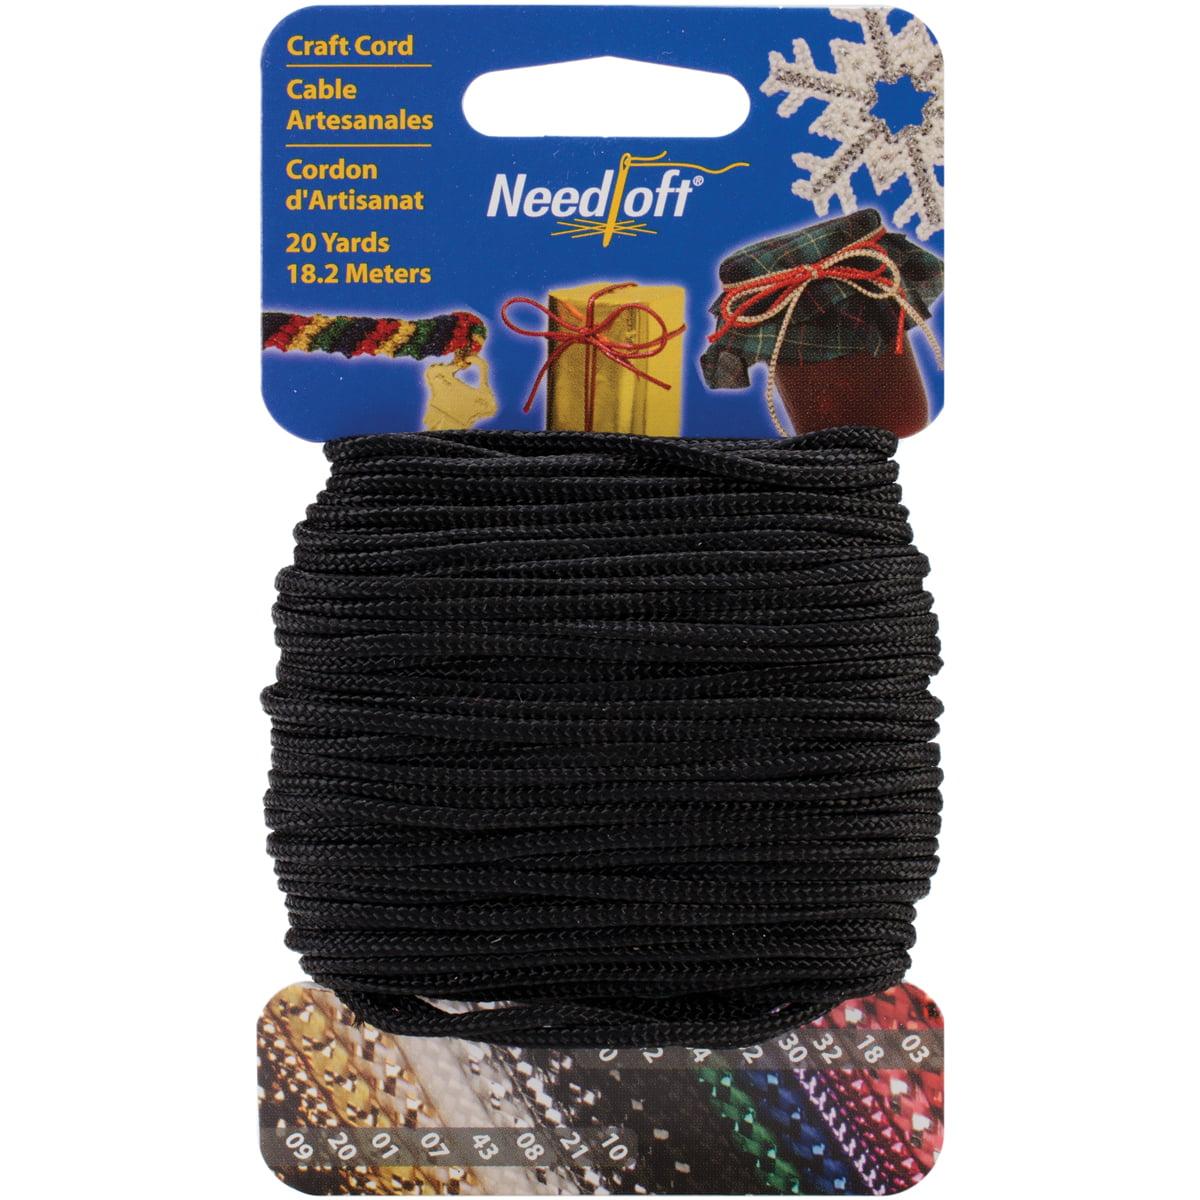 Needloft Novelty Craft Cord, 20-Yard, Solid Black Multi-Colored